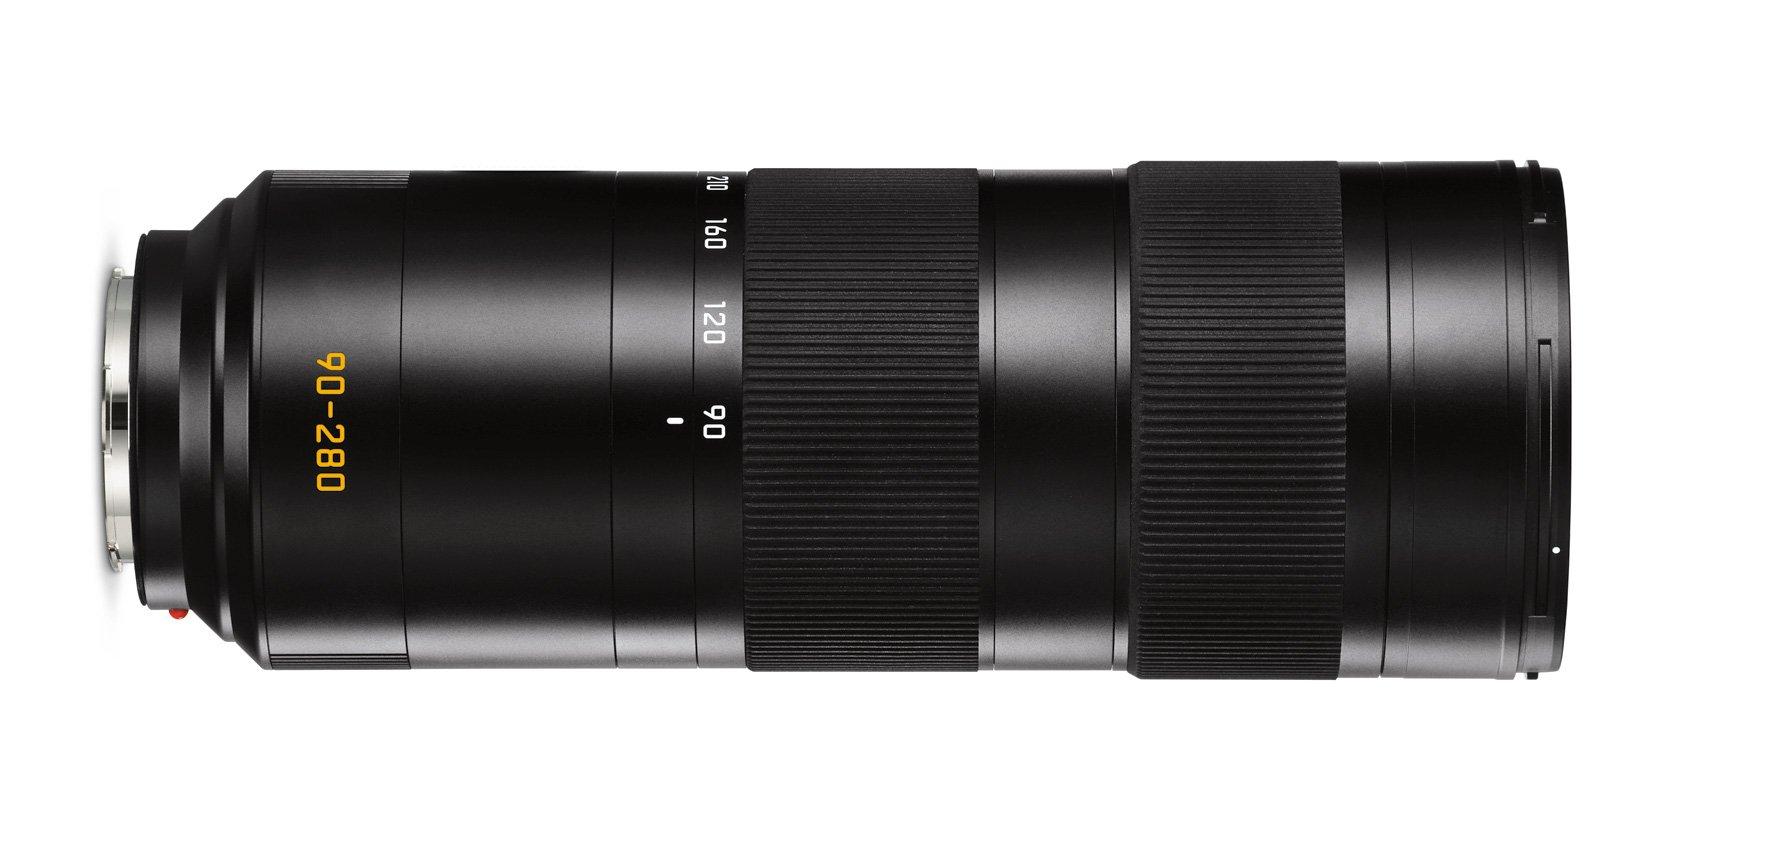 LEICA SL 90-280 mm f/2,8-4 Asph. Apo-Vario-Elmarit černý elox